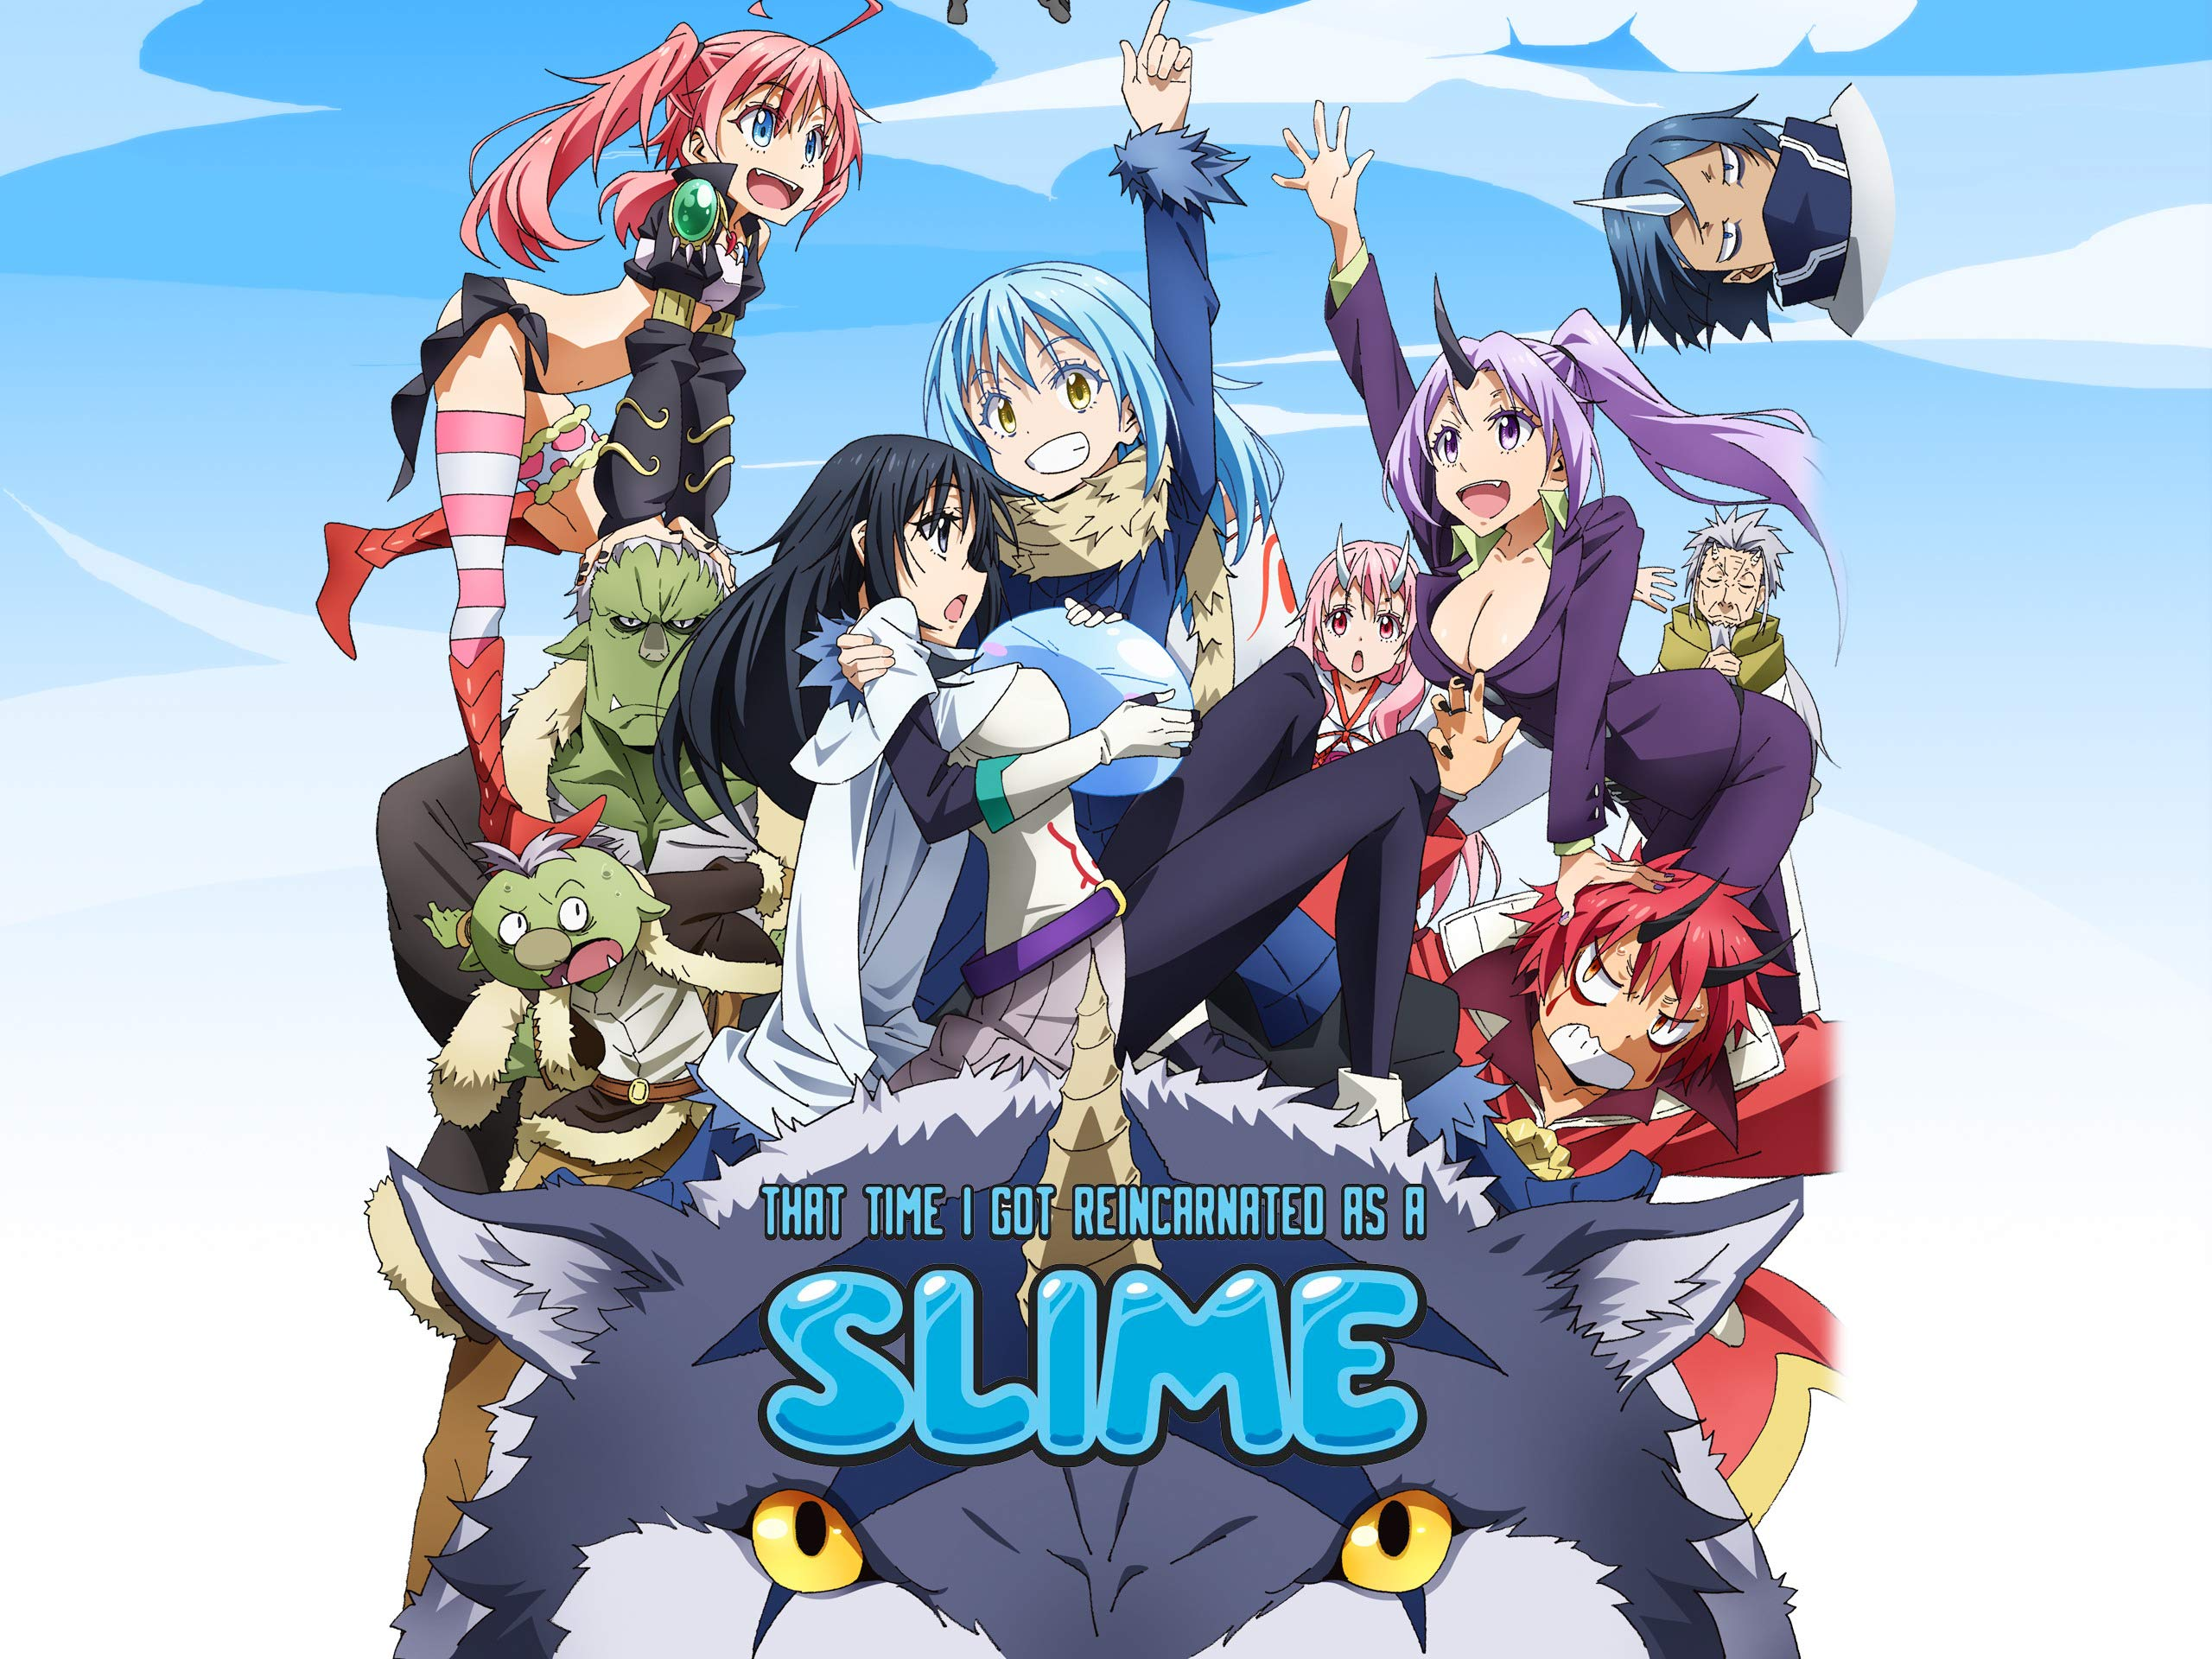 Anime Review: That Time I Got Reincarnated as a Slime Season 1